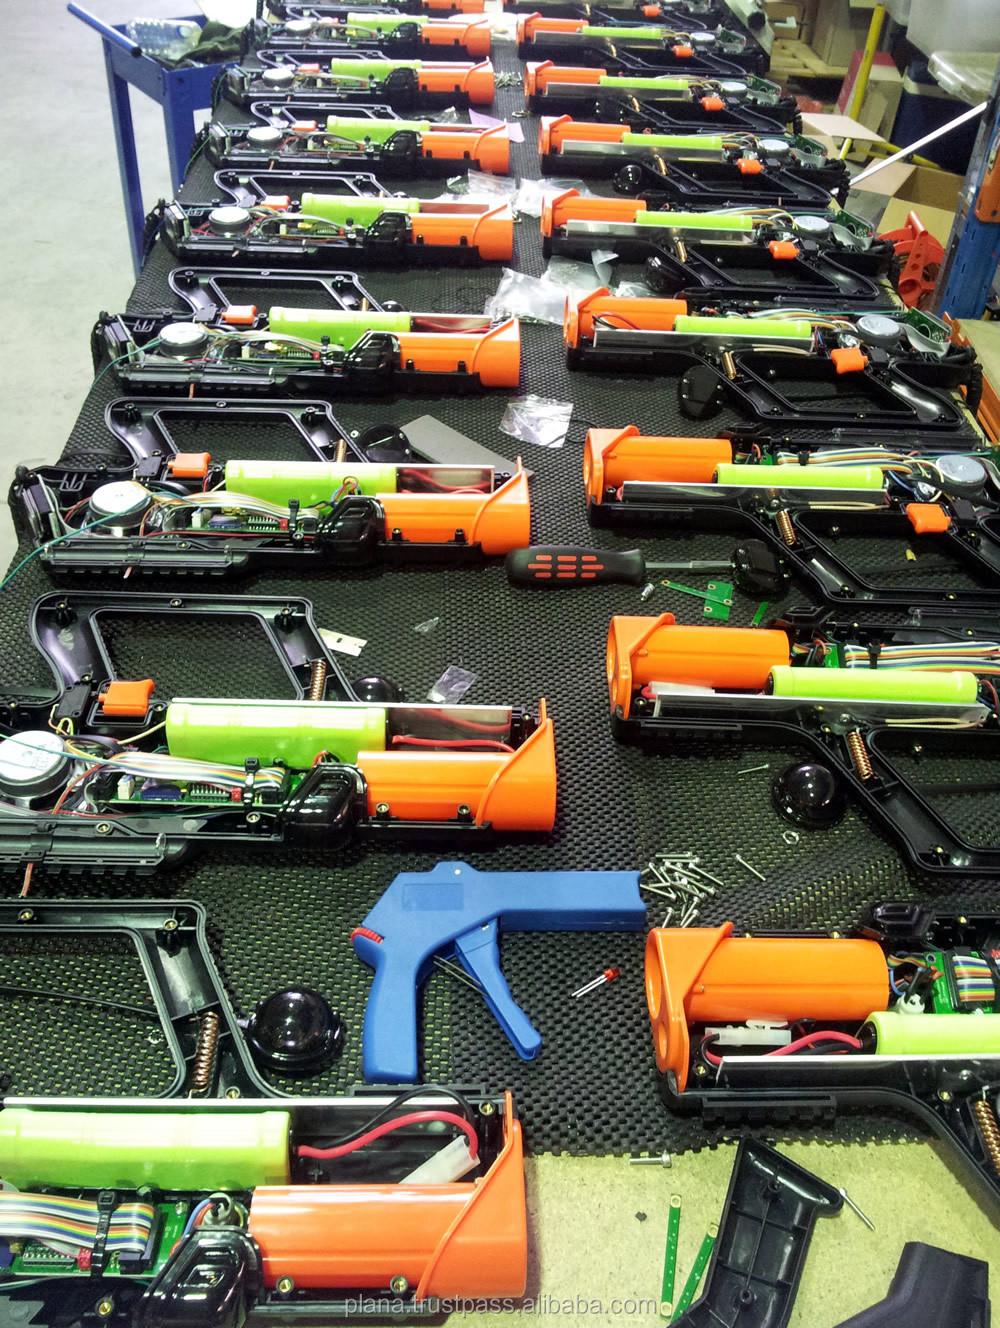 Laser Tag Equipment Cobra Buy Laser Tag Equipment Sale